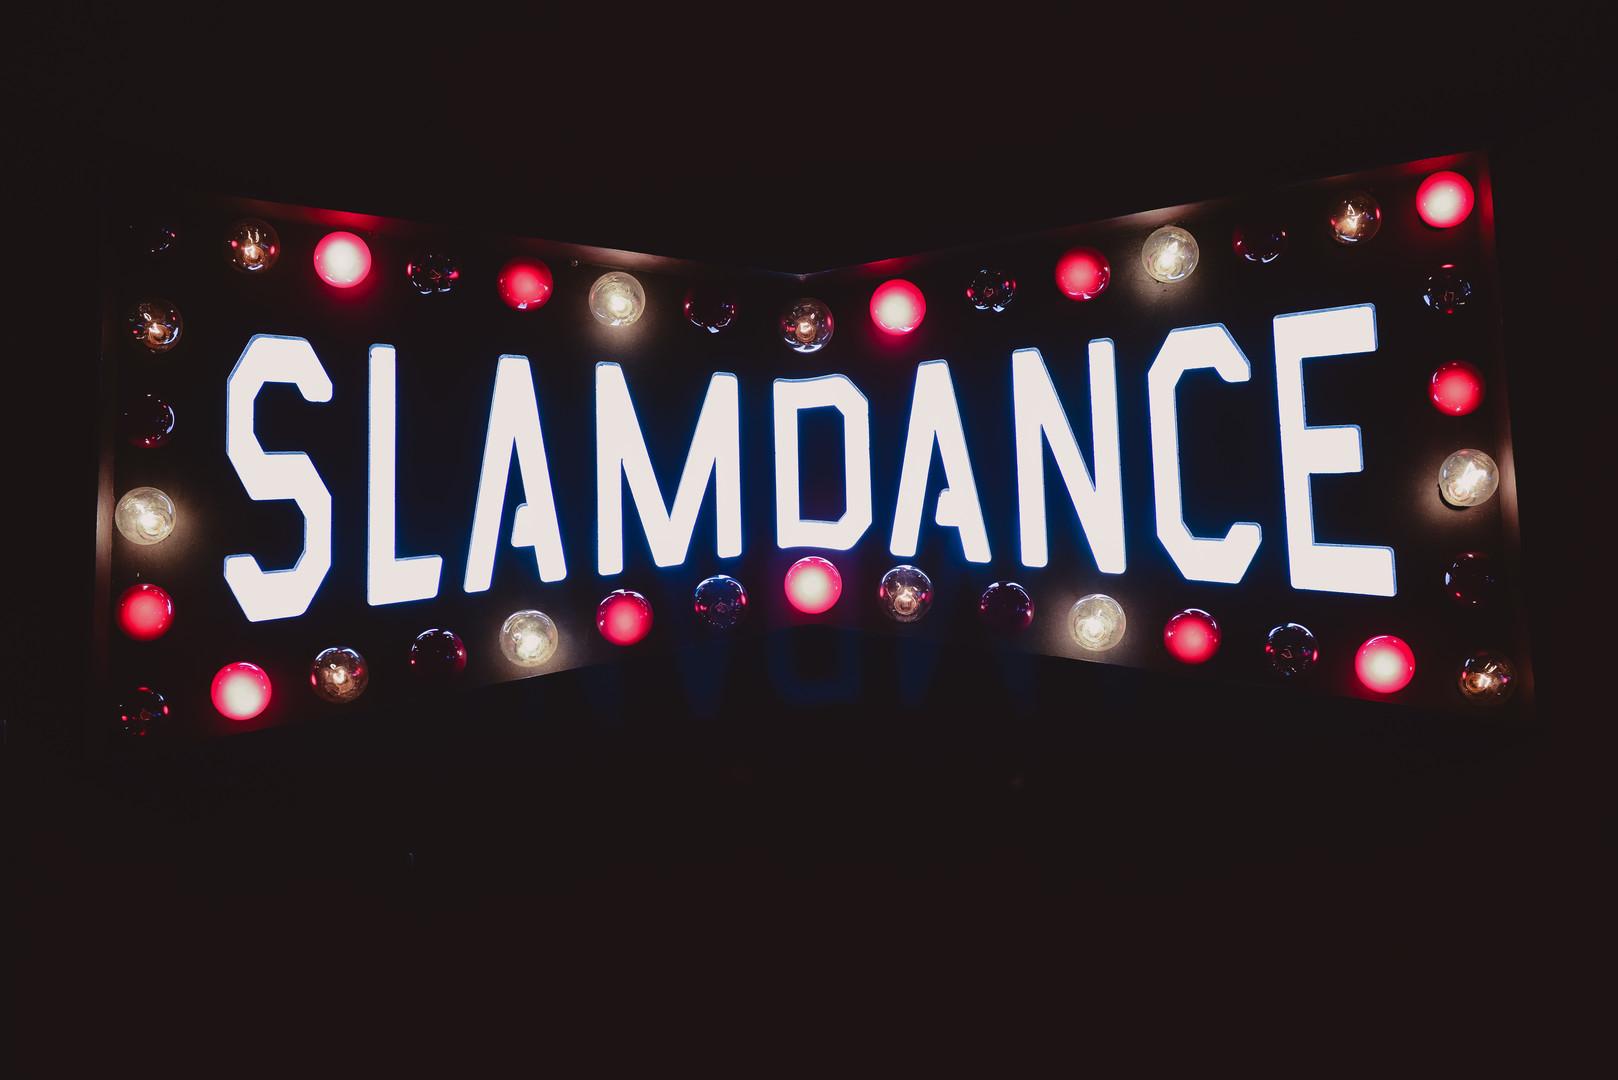 Slamdance sign lit up